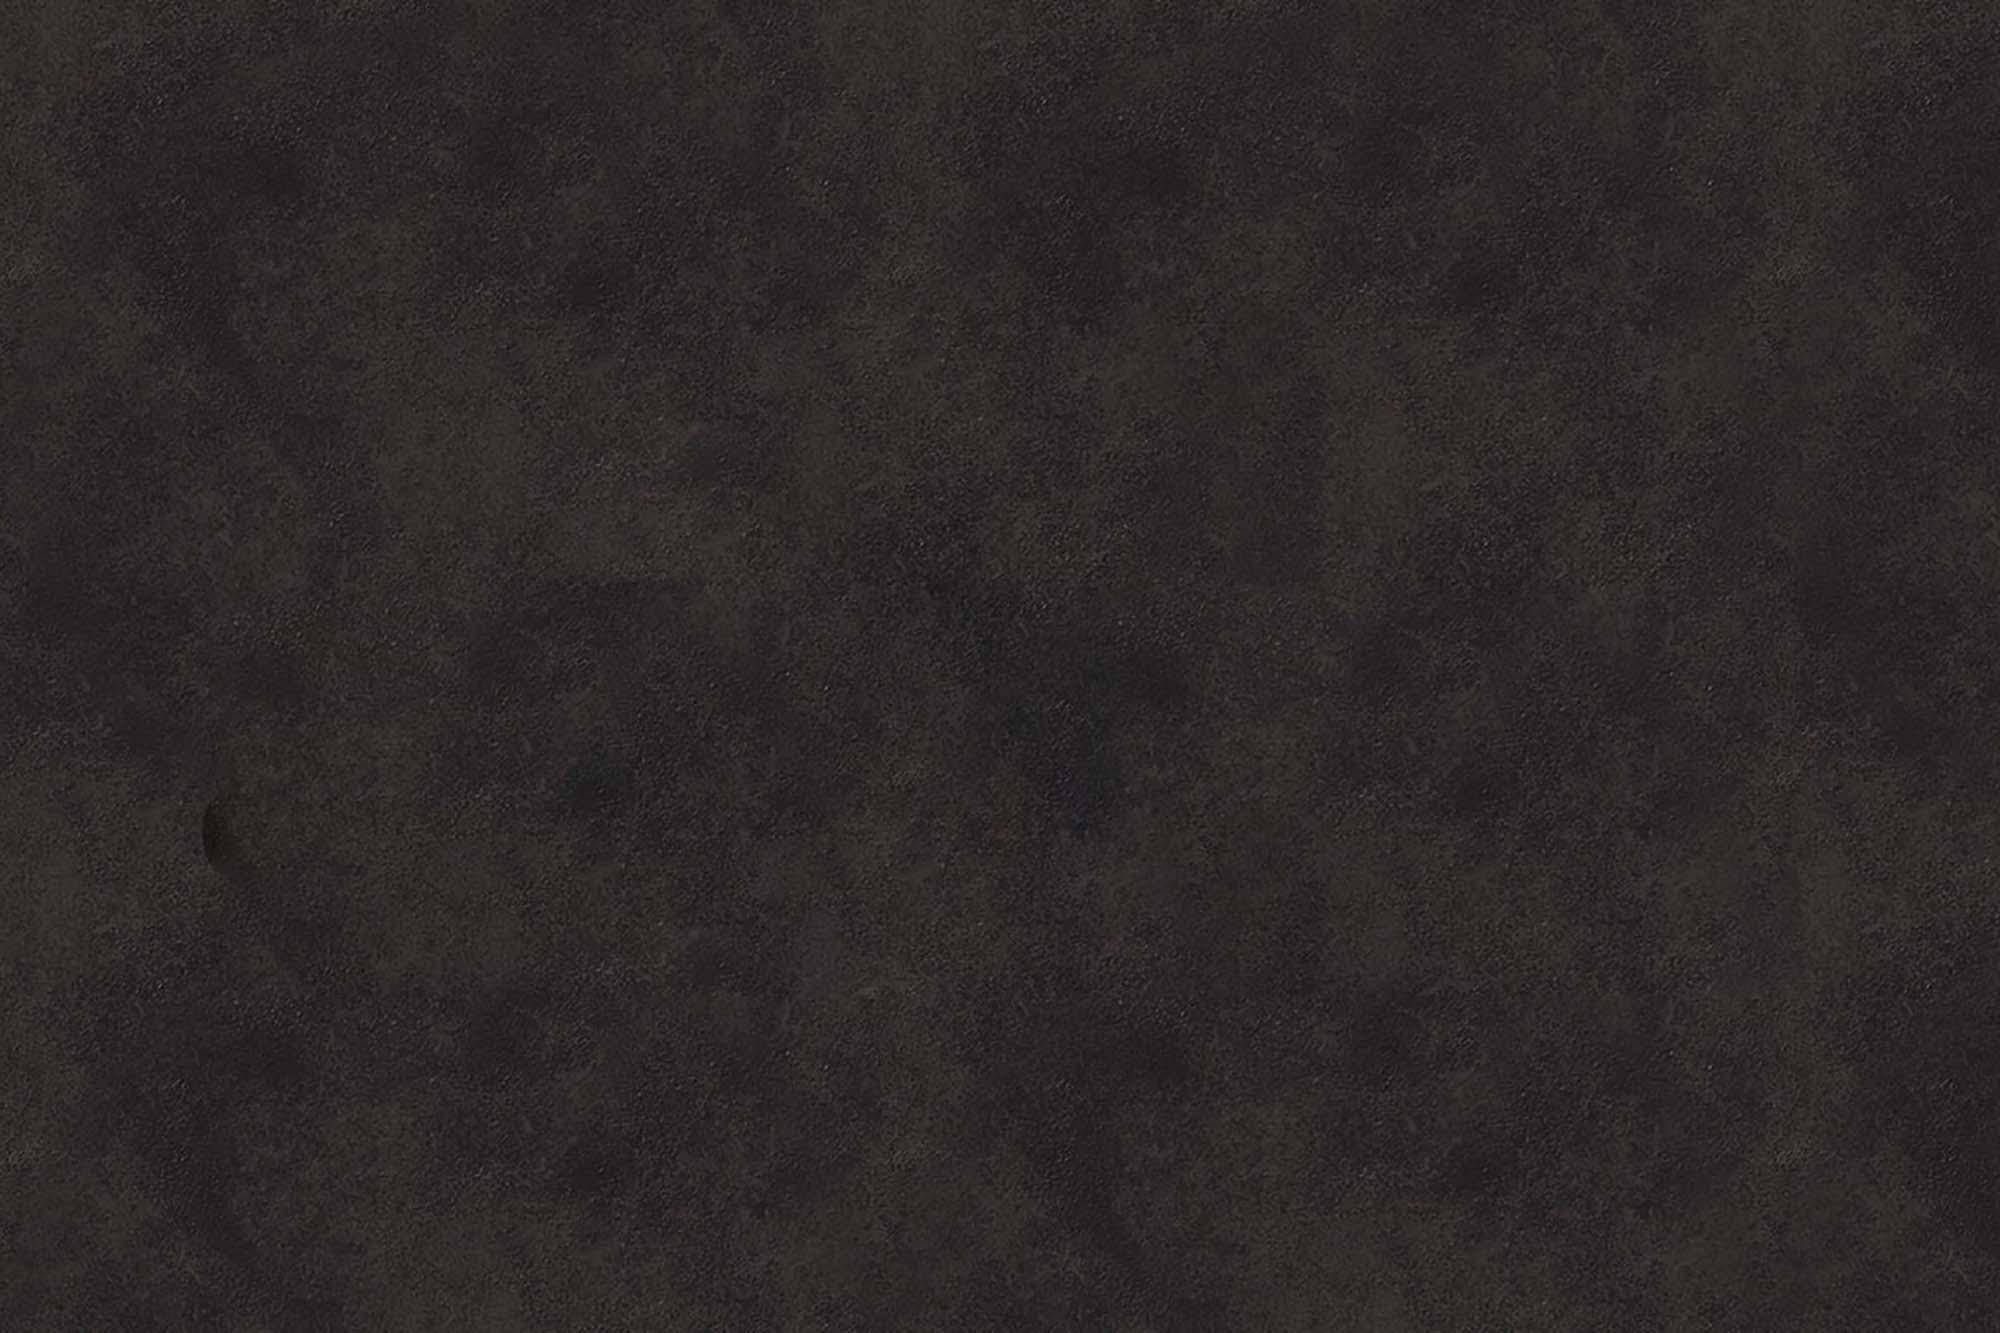 Seamless Grunge Pattern 3